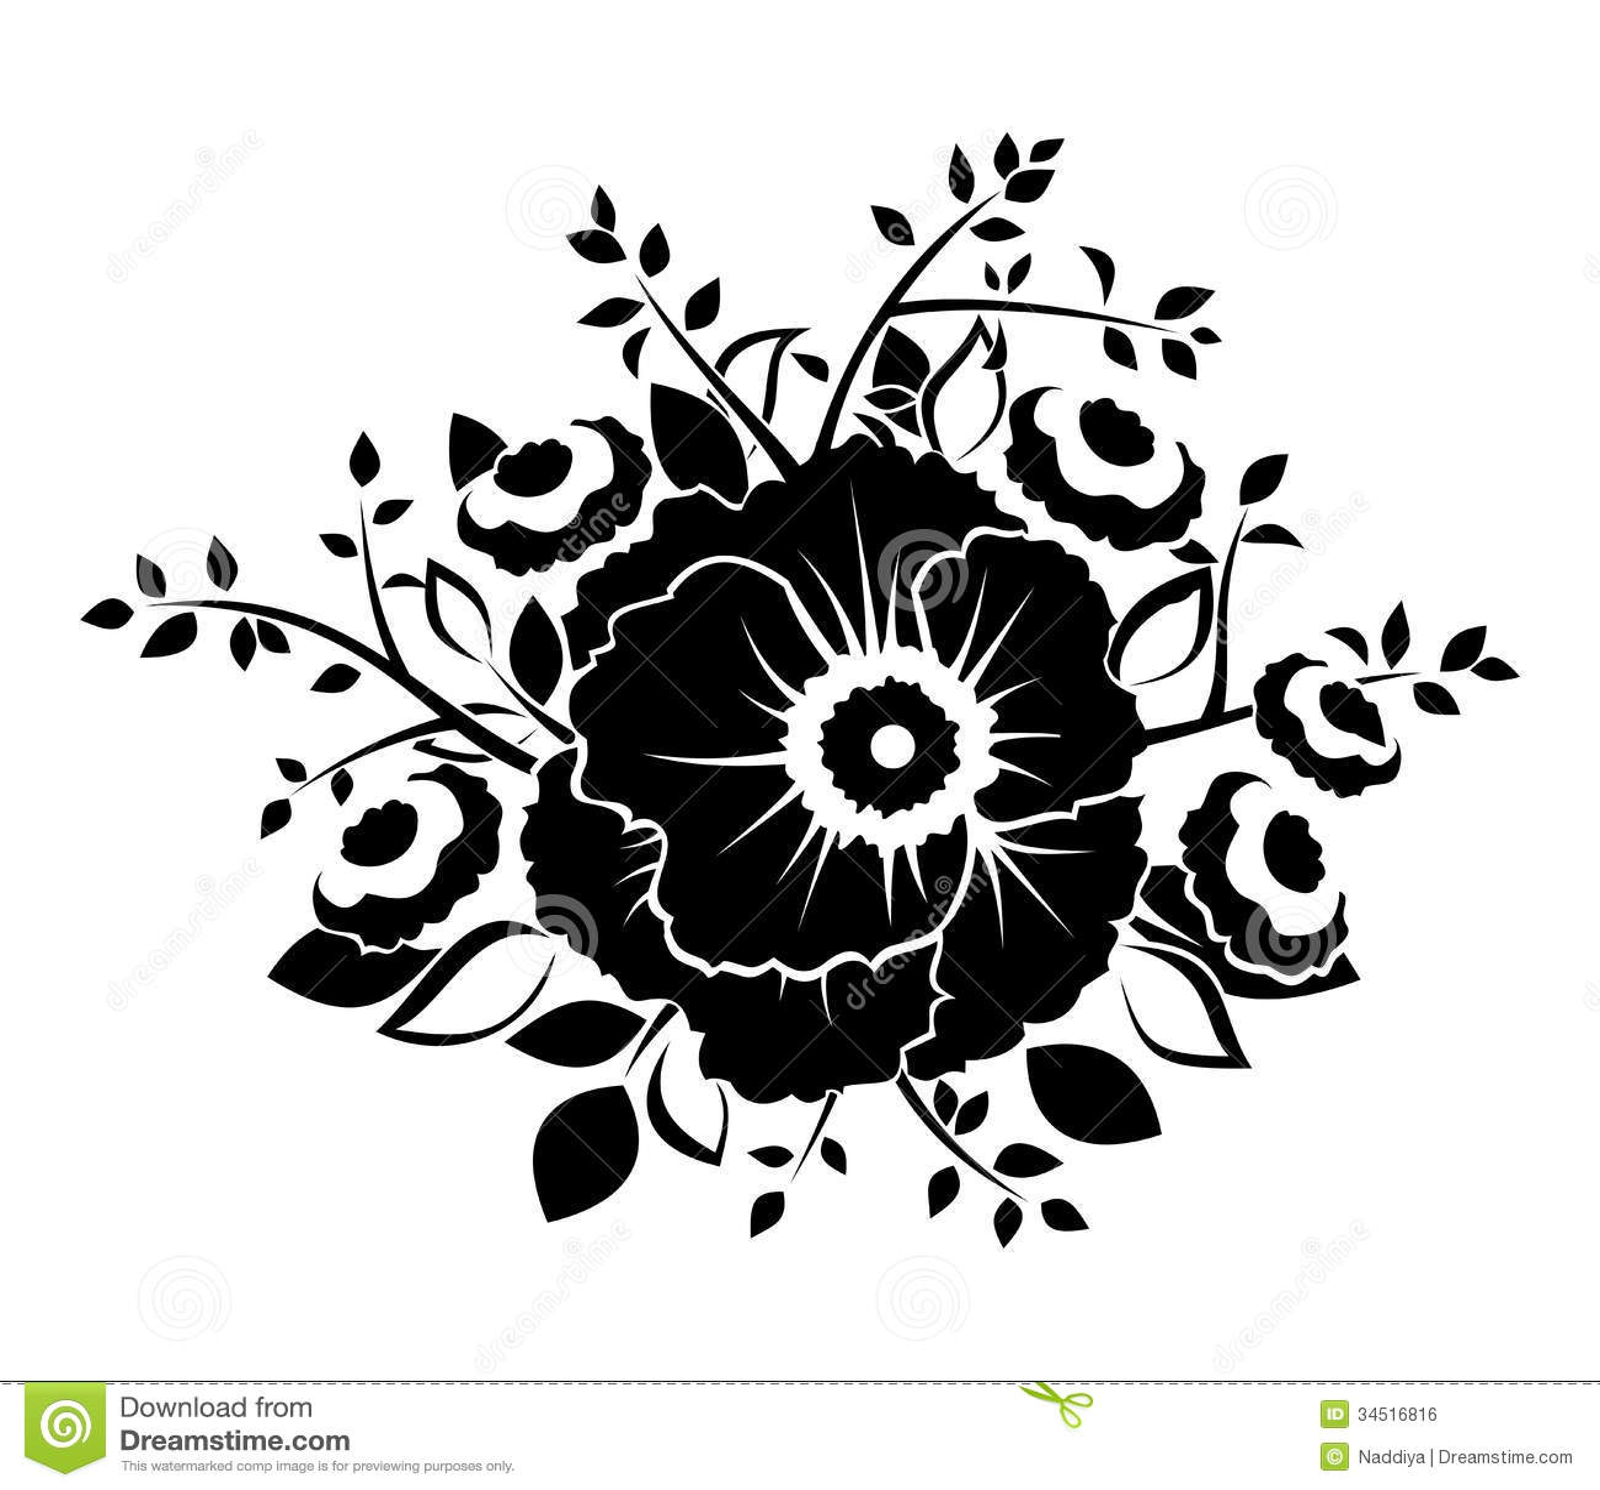 Black Flower On White Background Royalty Free Stock: Black Silhouette Of Flowers. Stock Vector